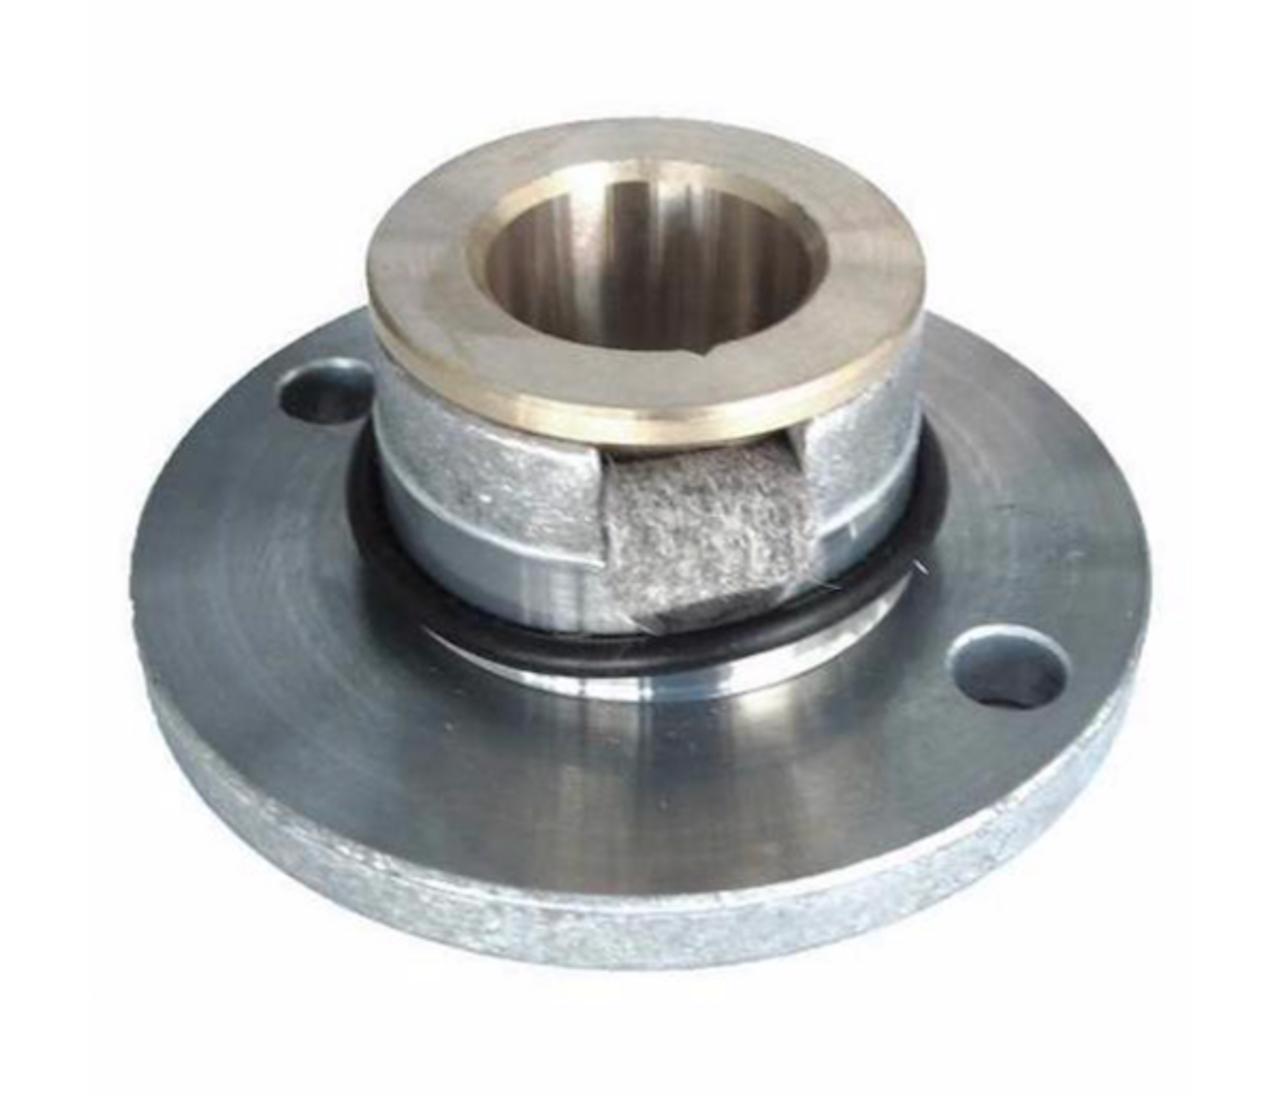 Armstrong Pumps 816133-000 Pump Bearing Assembly